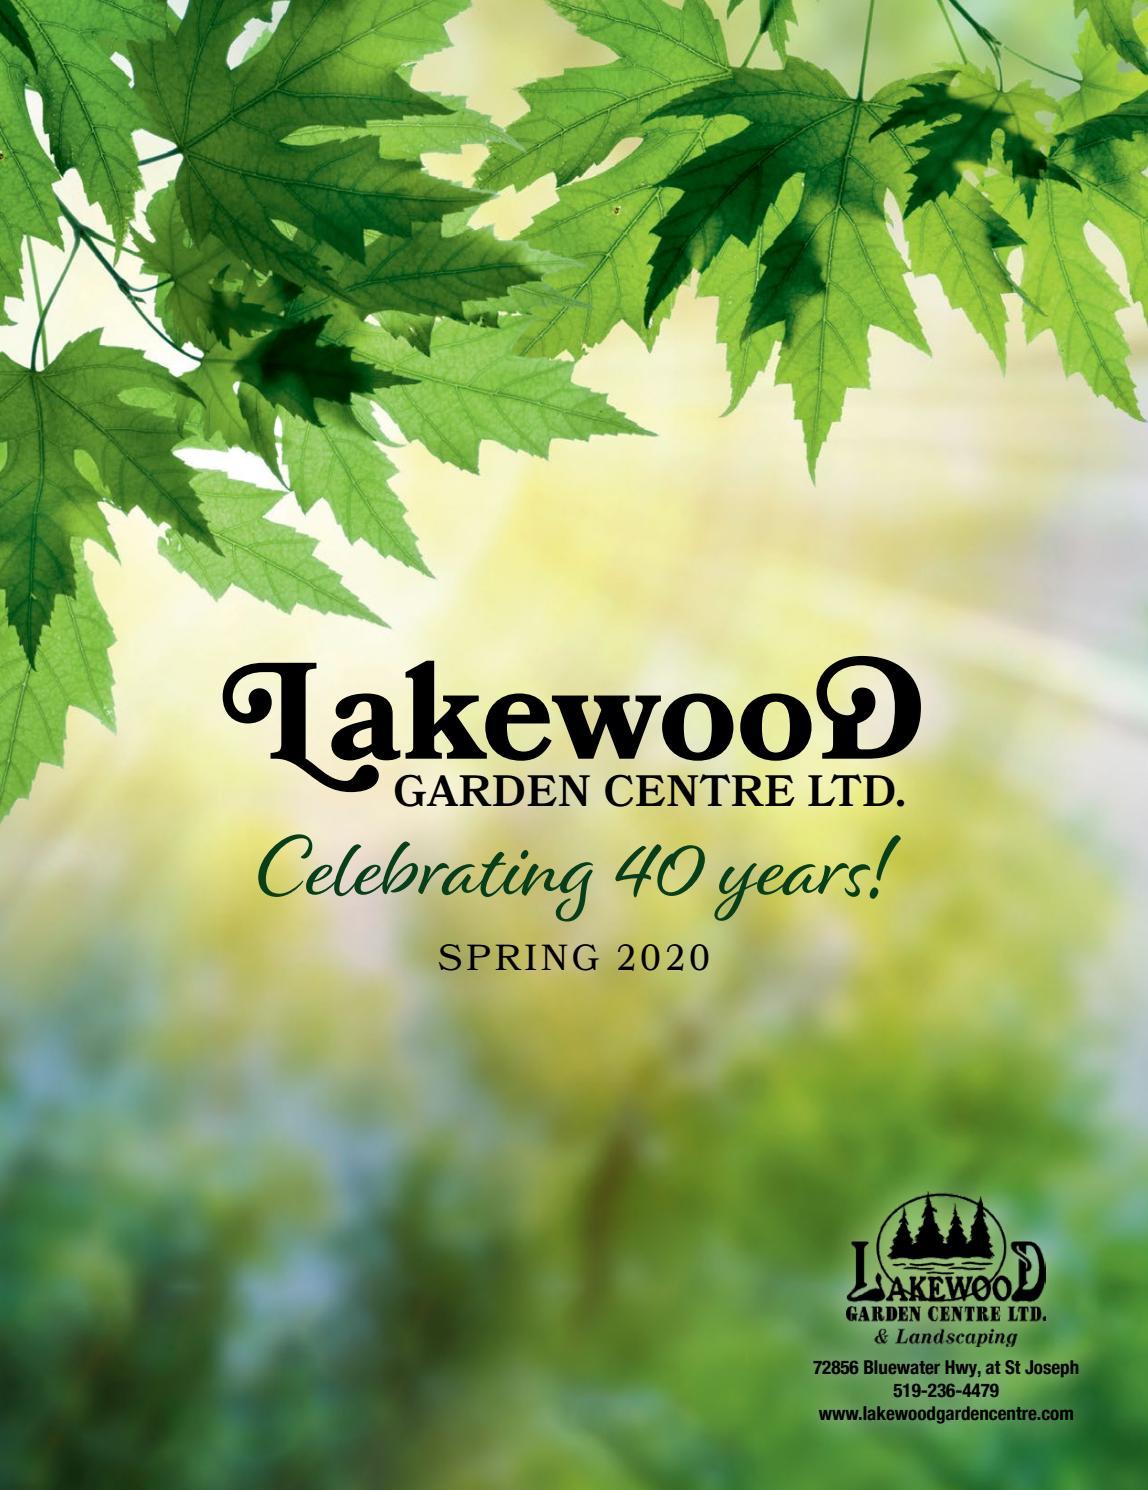 Lakewood Garden Centre Spring 2020 Magazine By Cr Creative Co Ltd Issuu